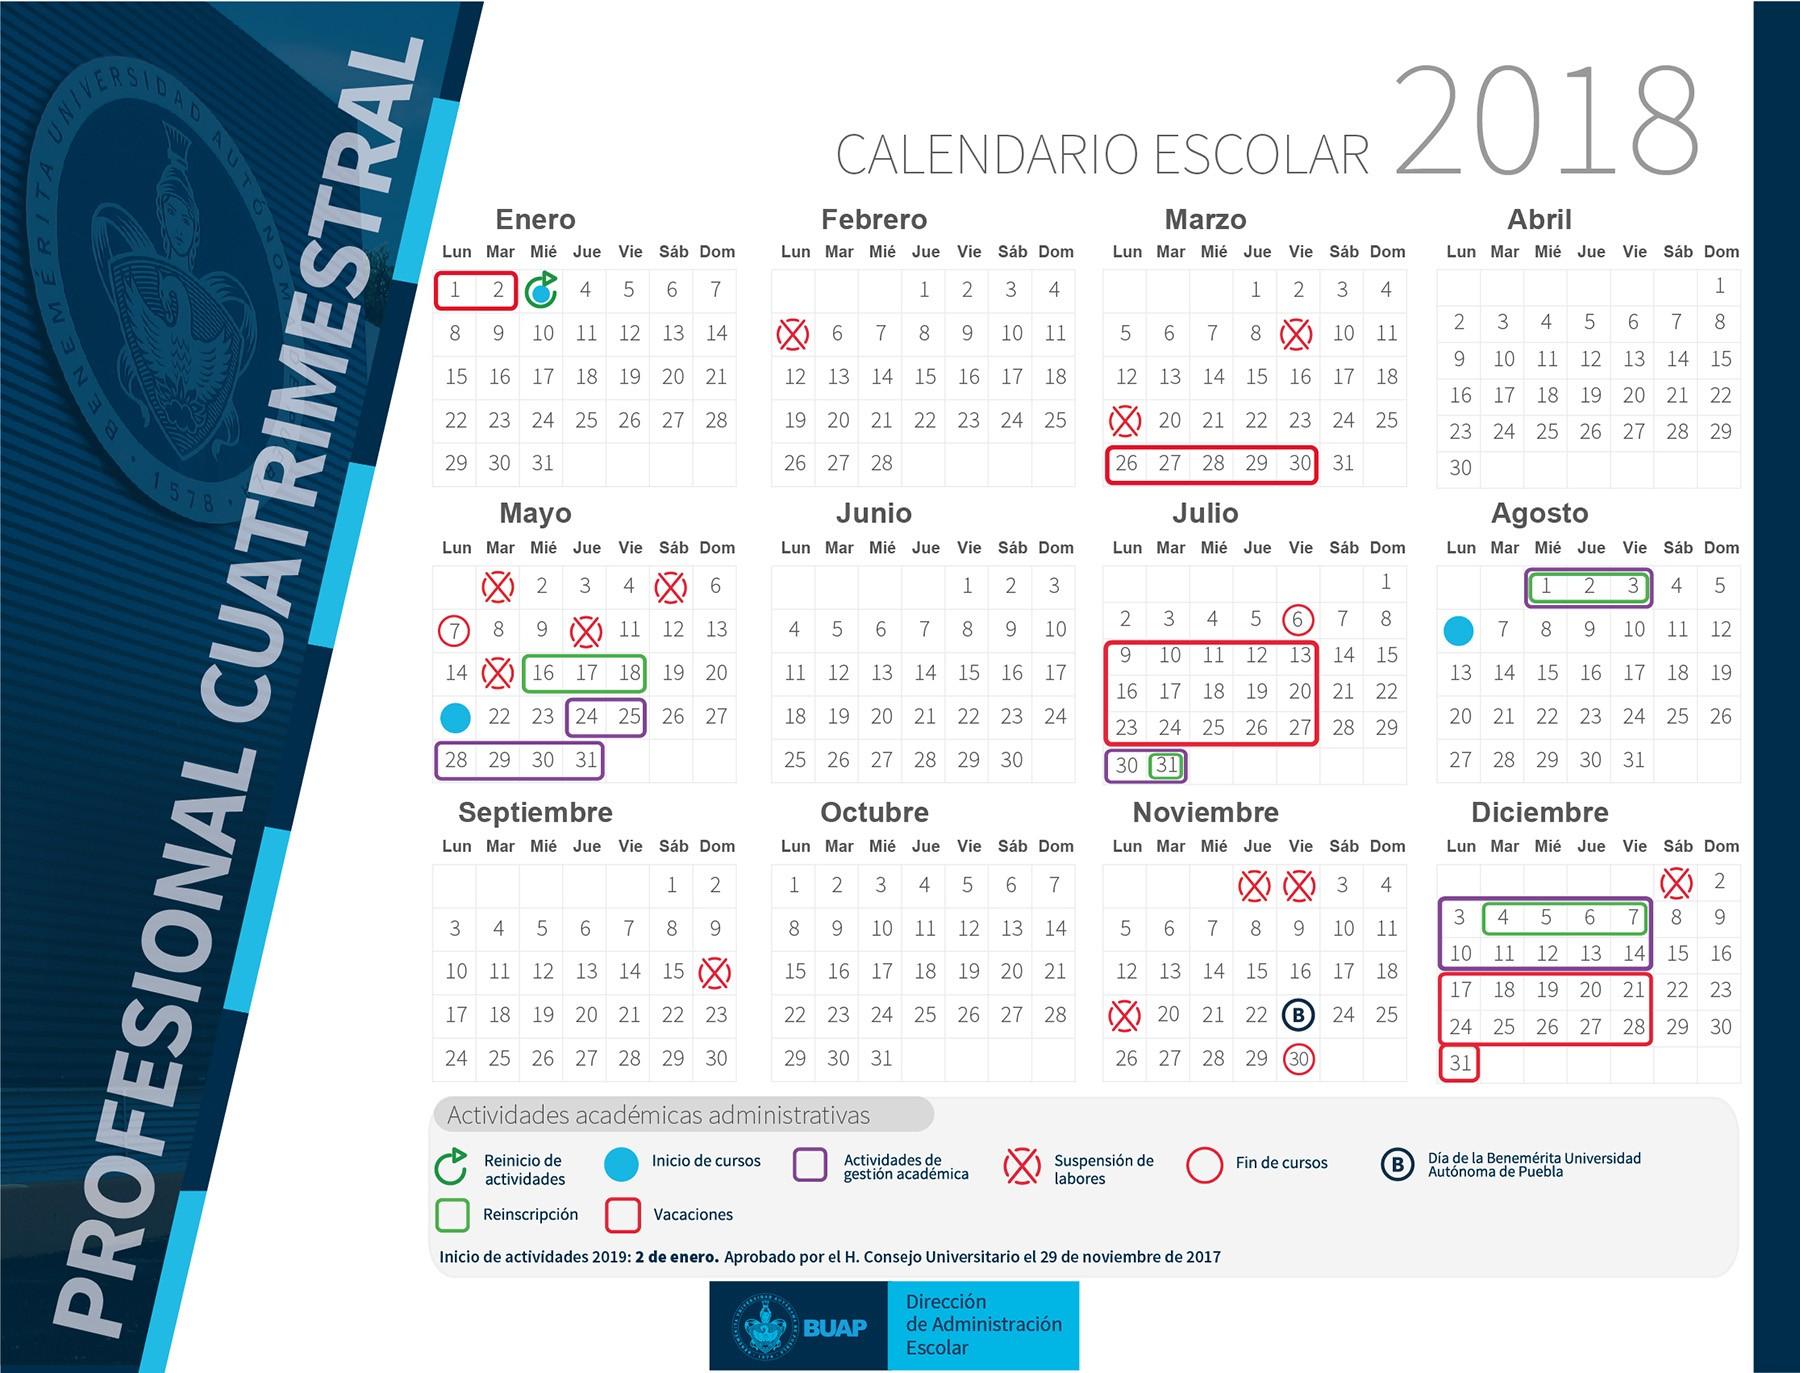 Calendario Escolar Zaragoza 2018 Y 2019 Actual Calendario Escolar 2018 Benemérita Universidad Aut³noma De Puebla Of Calendario Escolar Zaragoza 2018 Y 2019 Más Reciente Calendario Escolar – Ies Emilio Jimeno